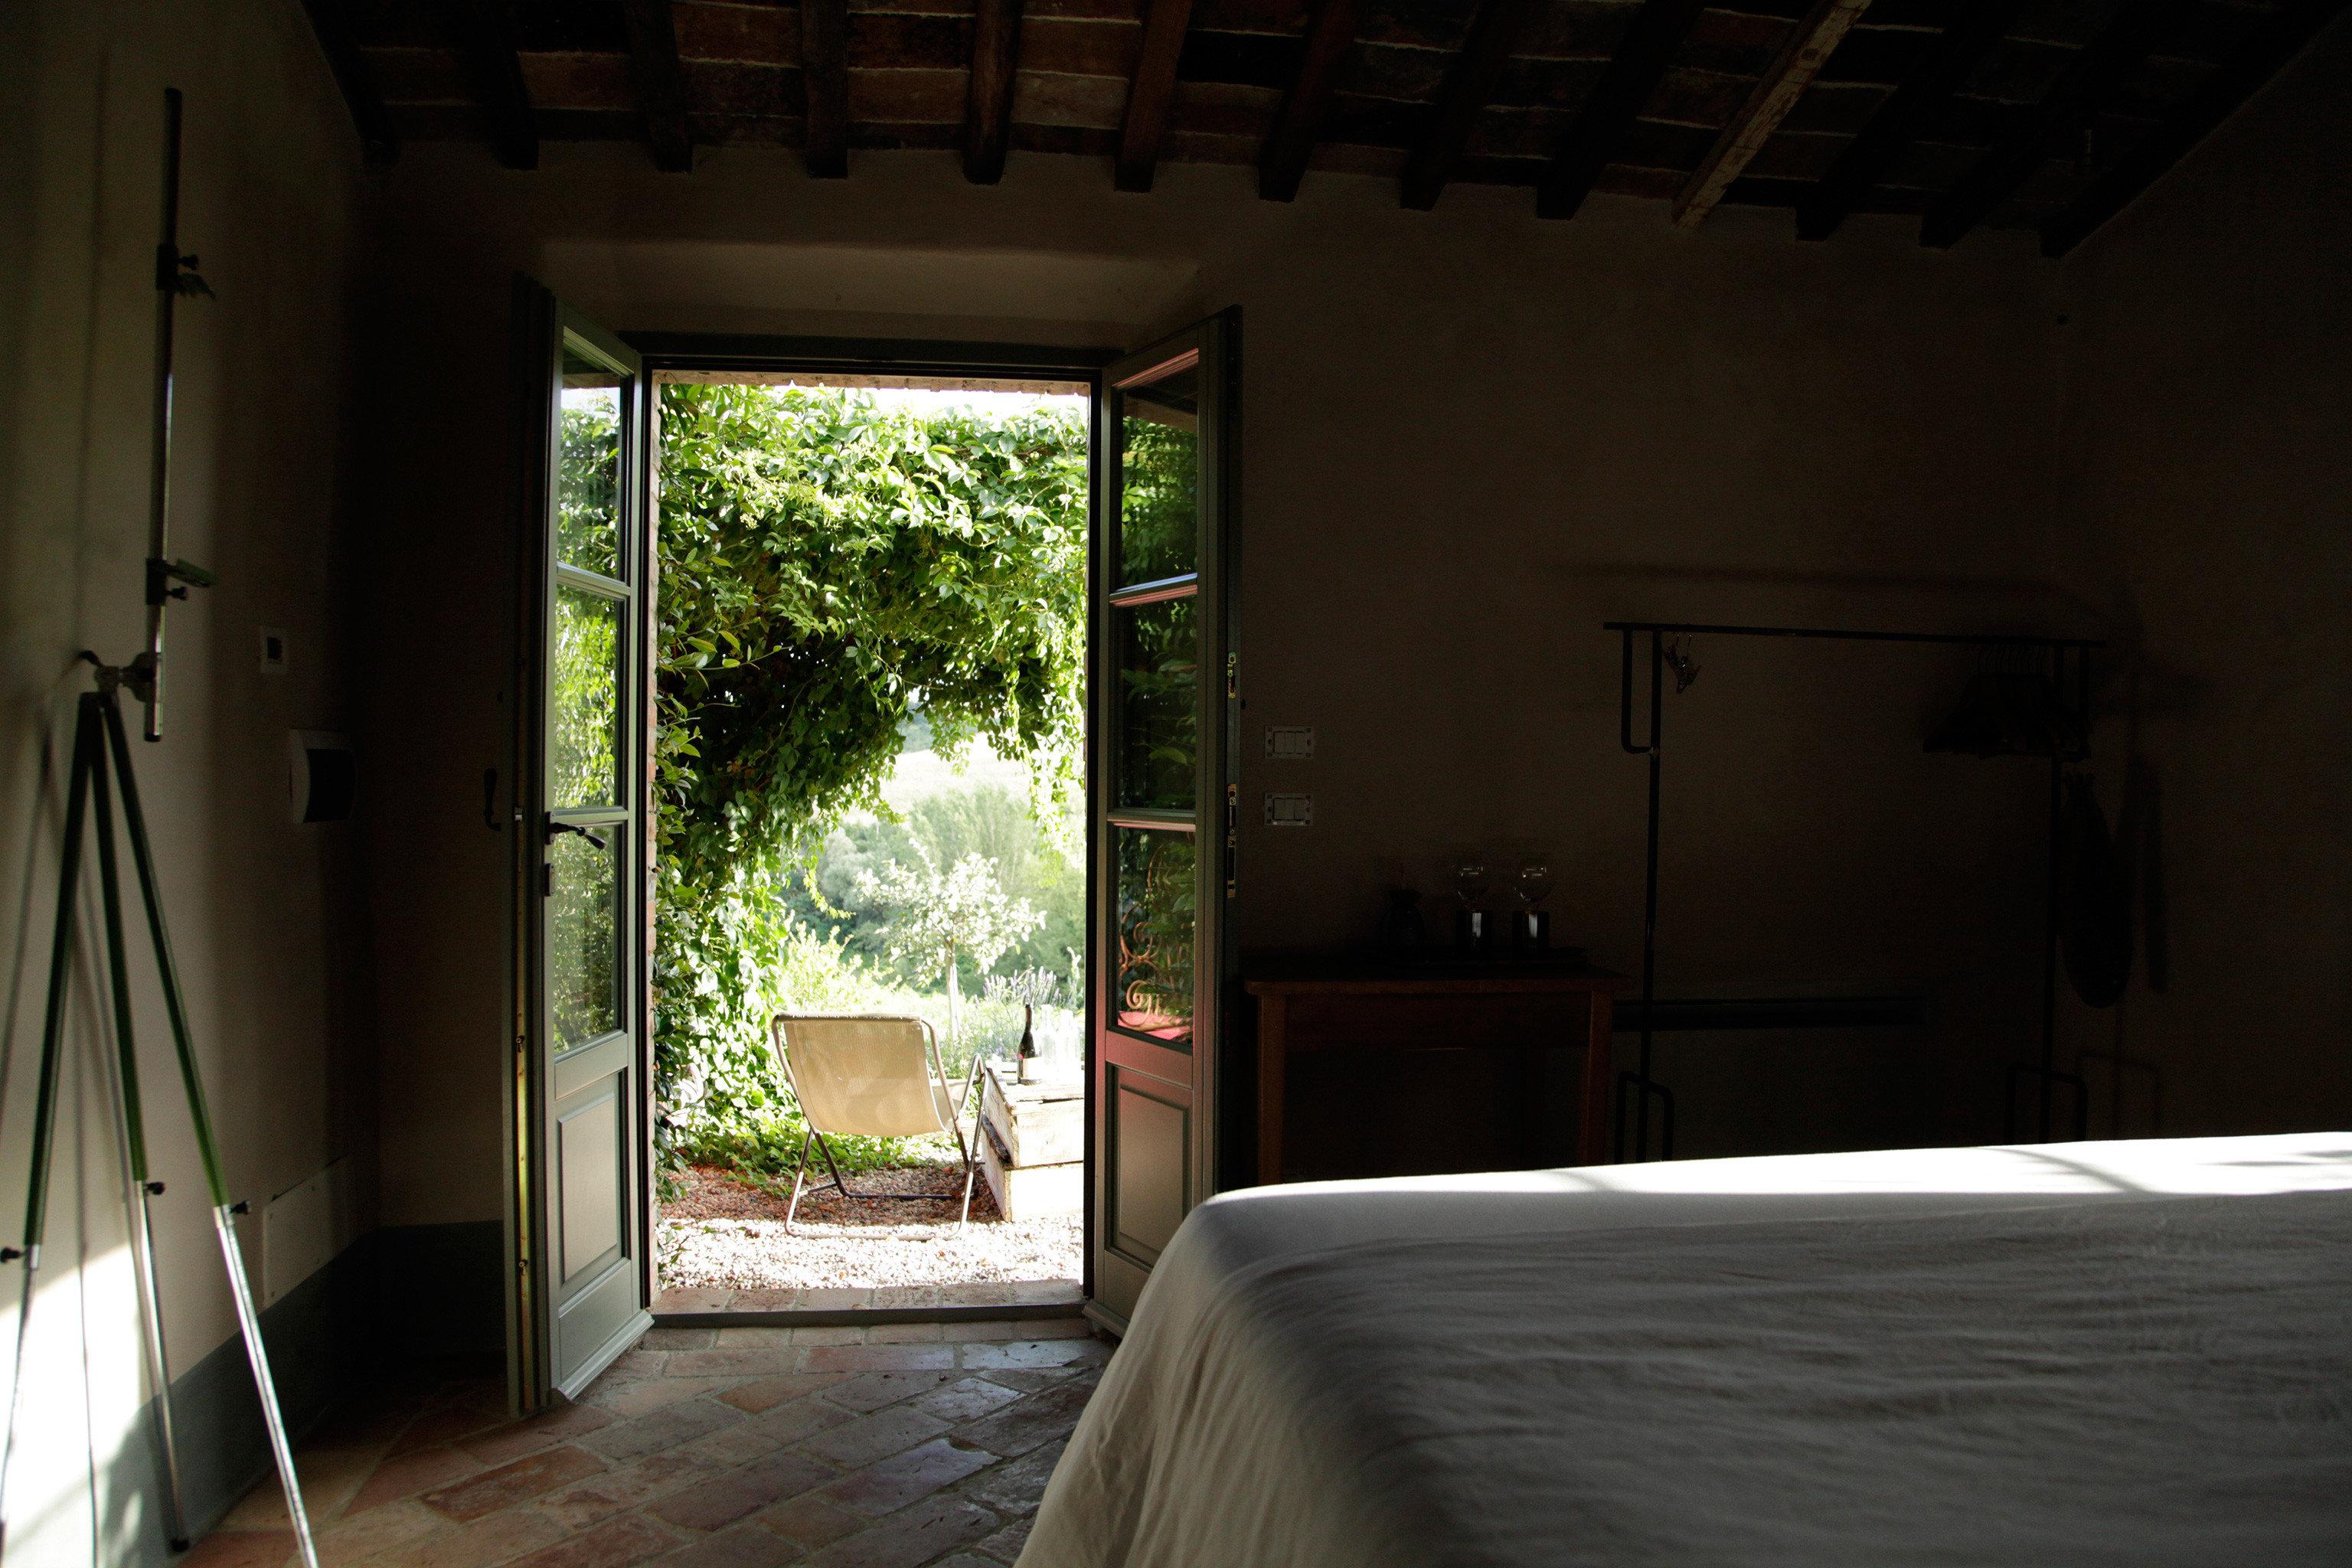 B&B Bedroom Country Elegant Luxury Romantic Suite house property building home cottage living room Villa